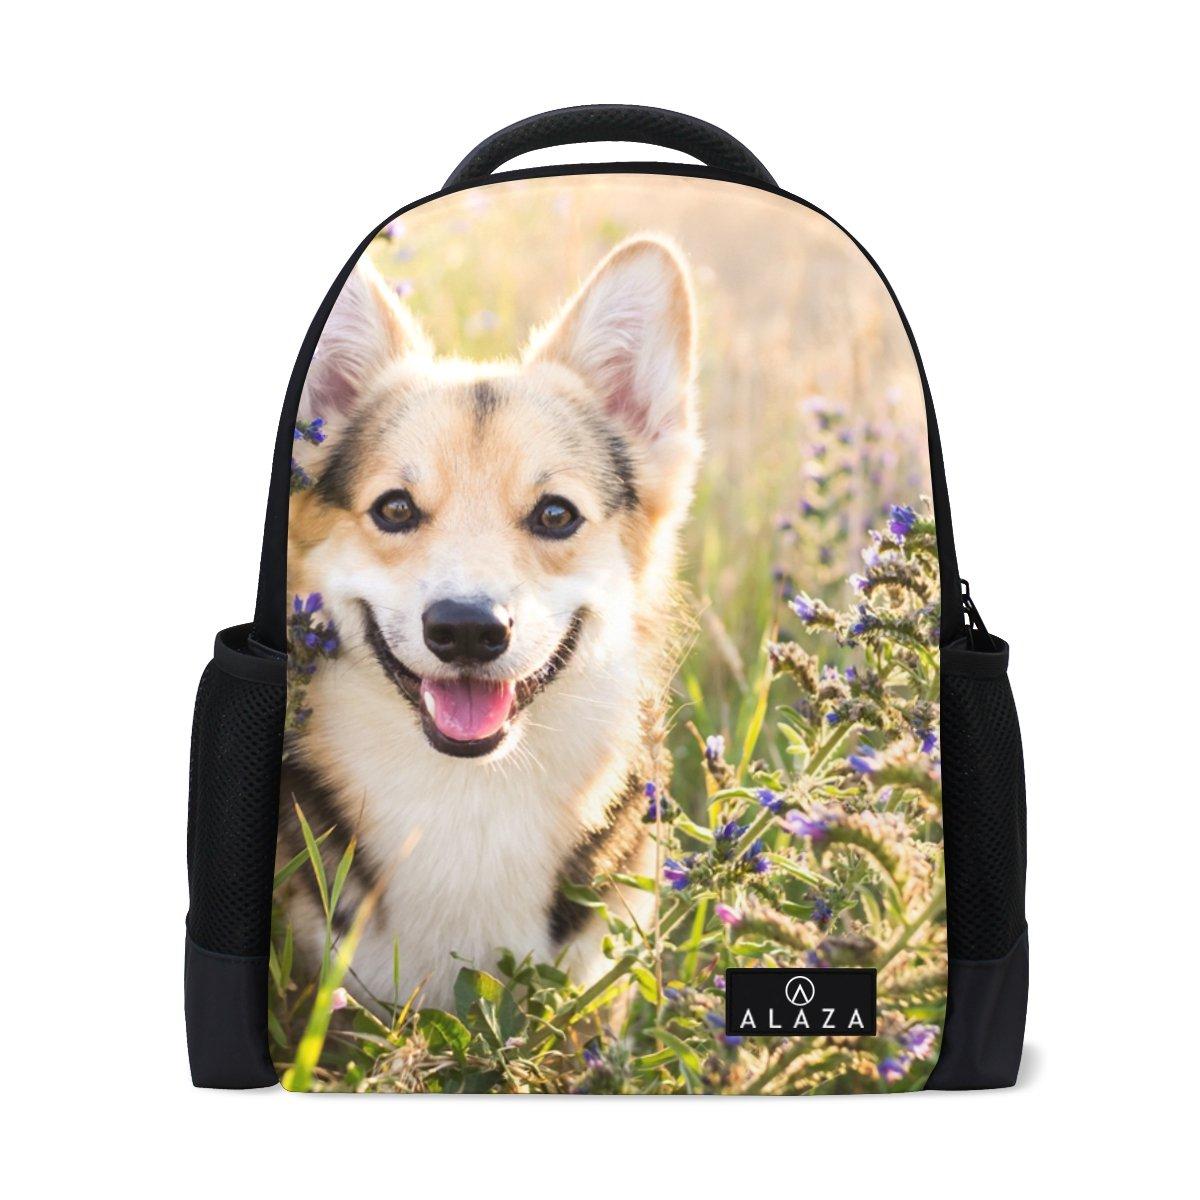 My Daily Happy Welsh Corgi Dog Flower Backpack 14 Inch Laptop Daypack Bookbag for Travel College School